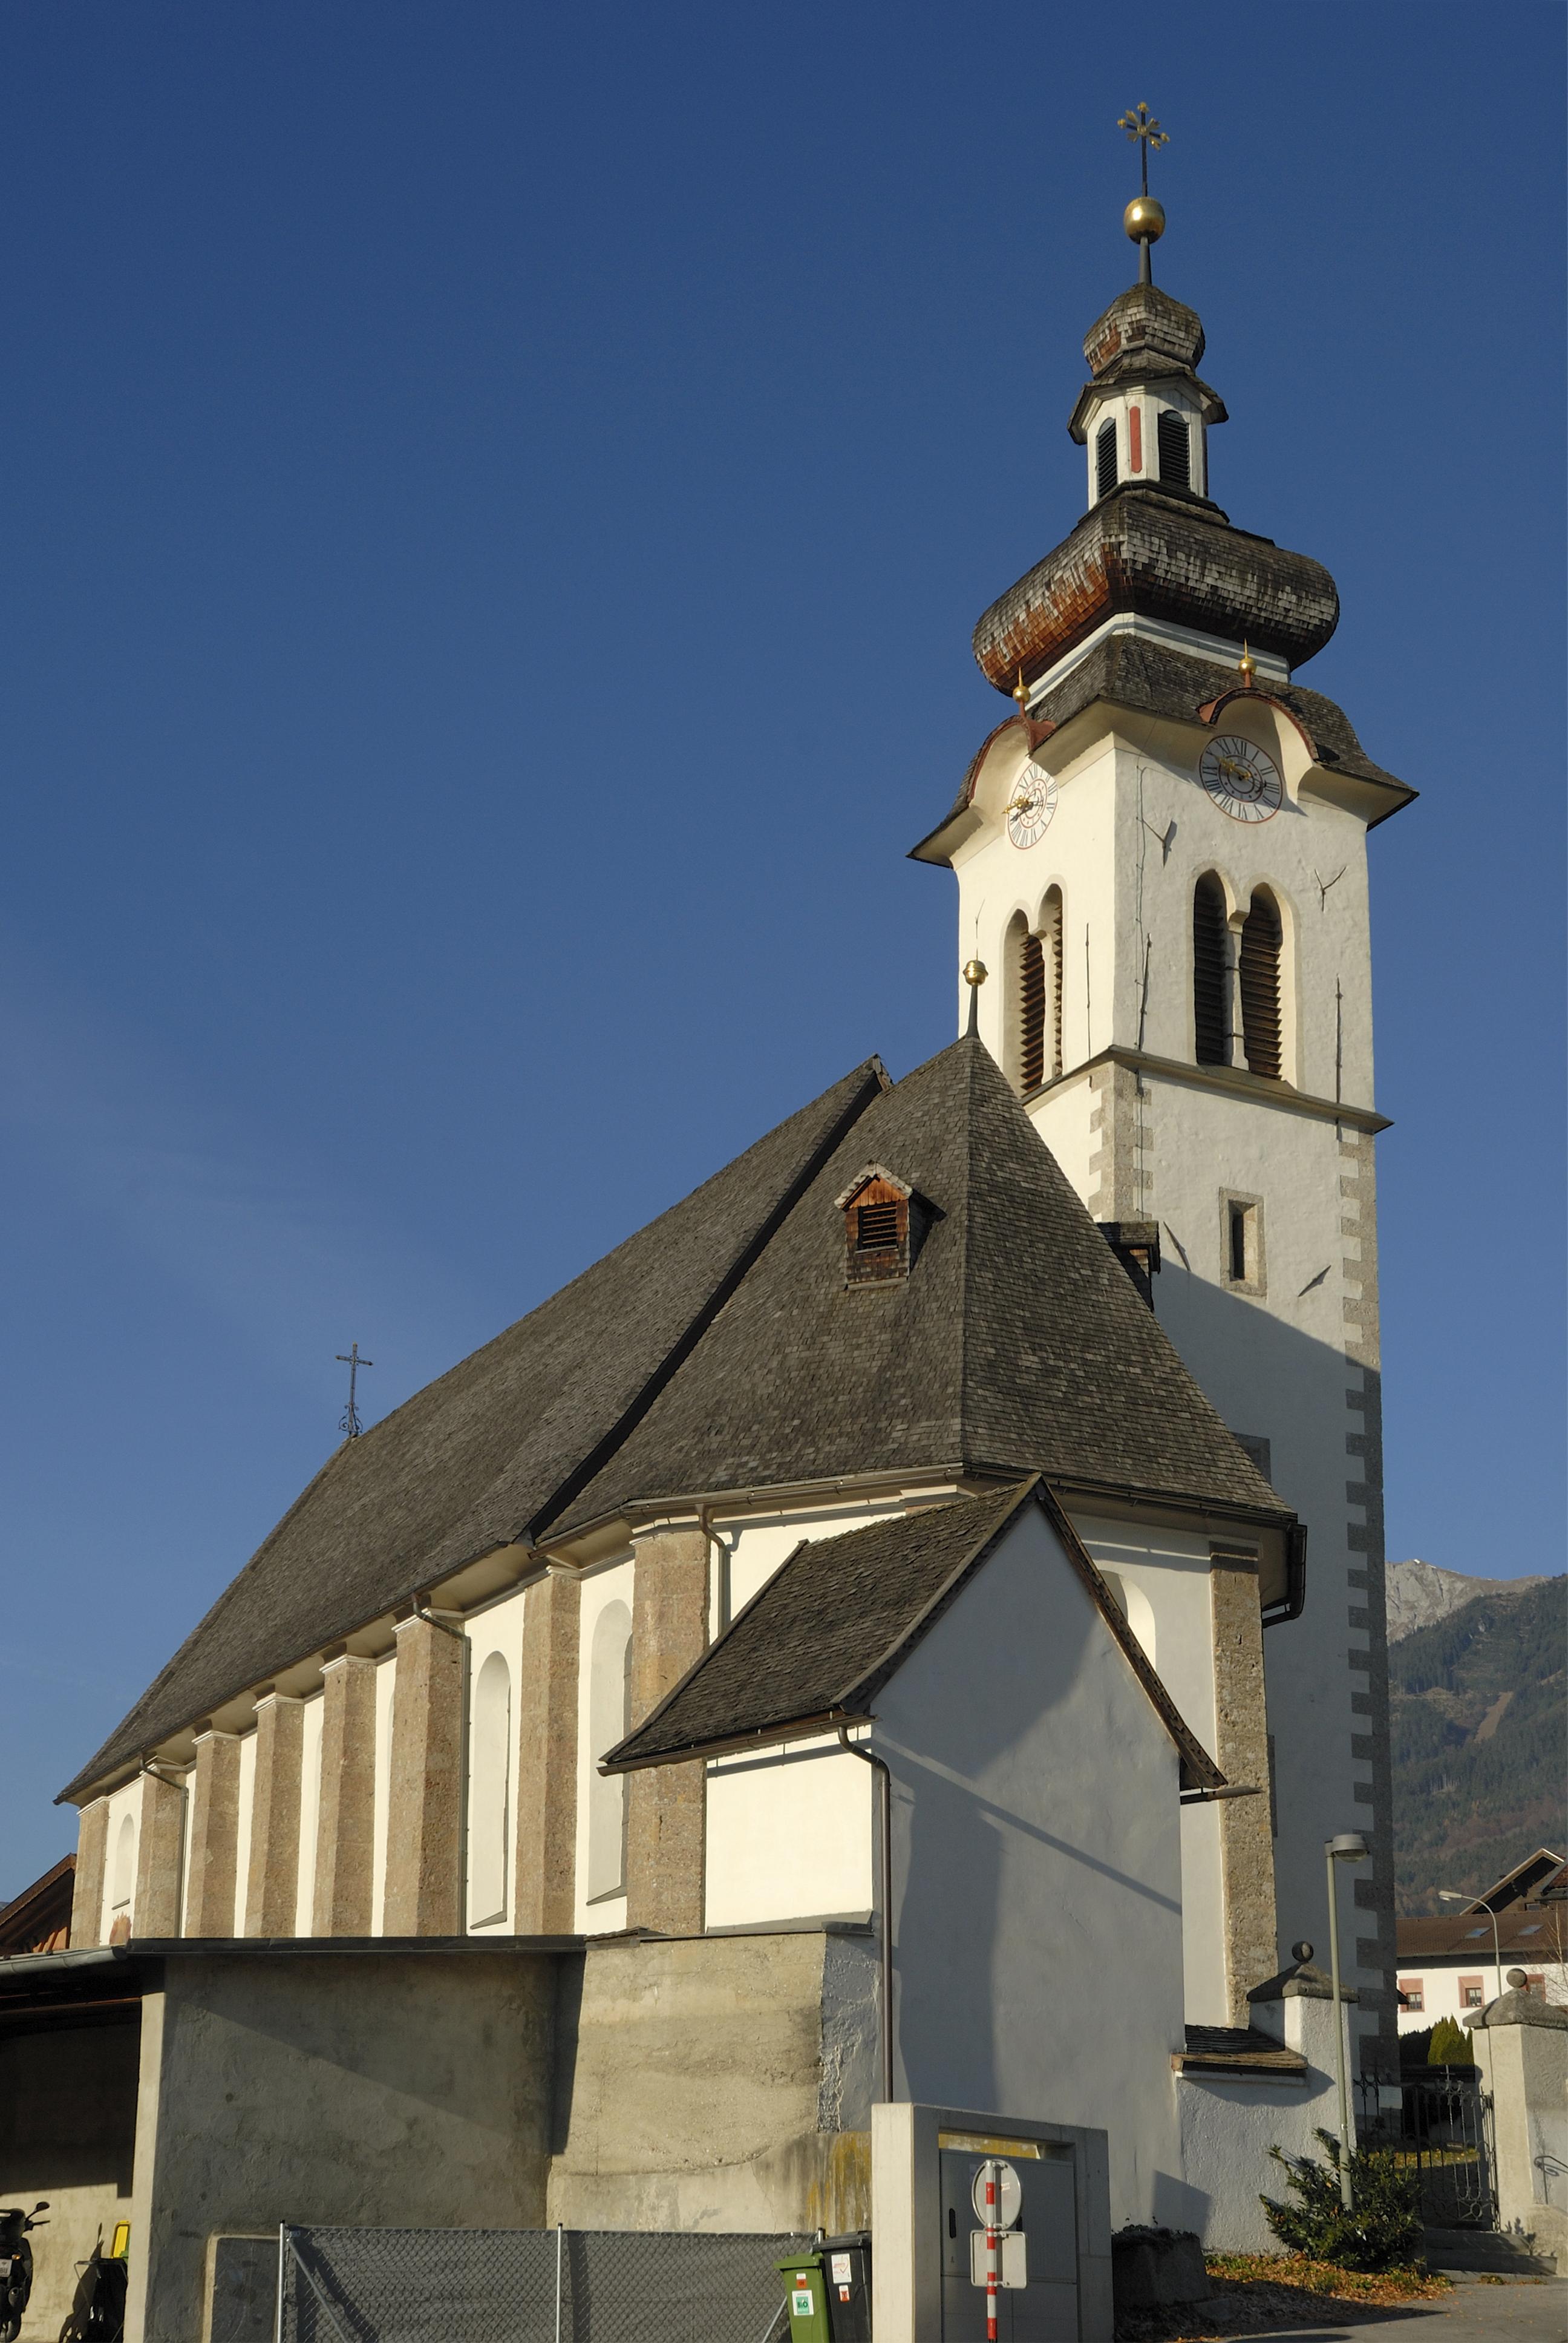 Immobilien in Arzl - Bezirk Innsbruck - Stadt | huggology.com